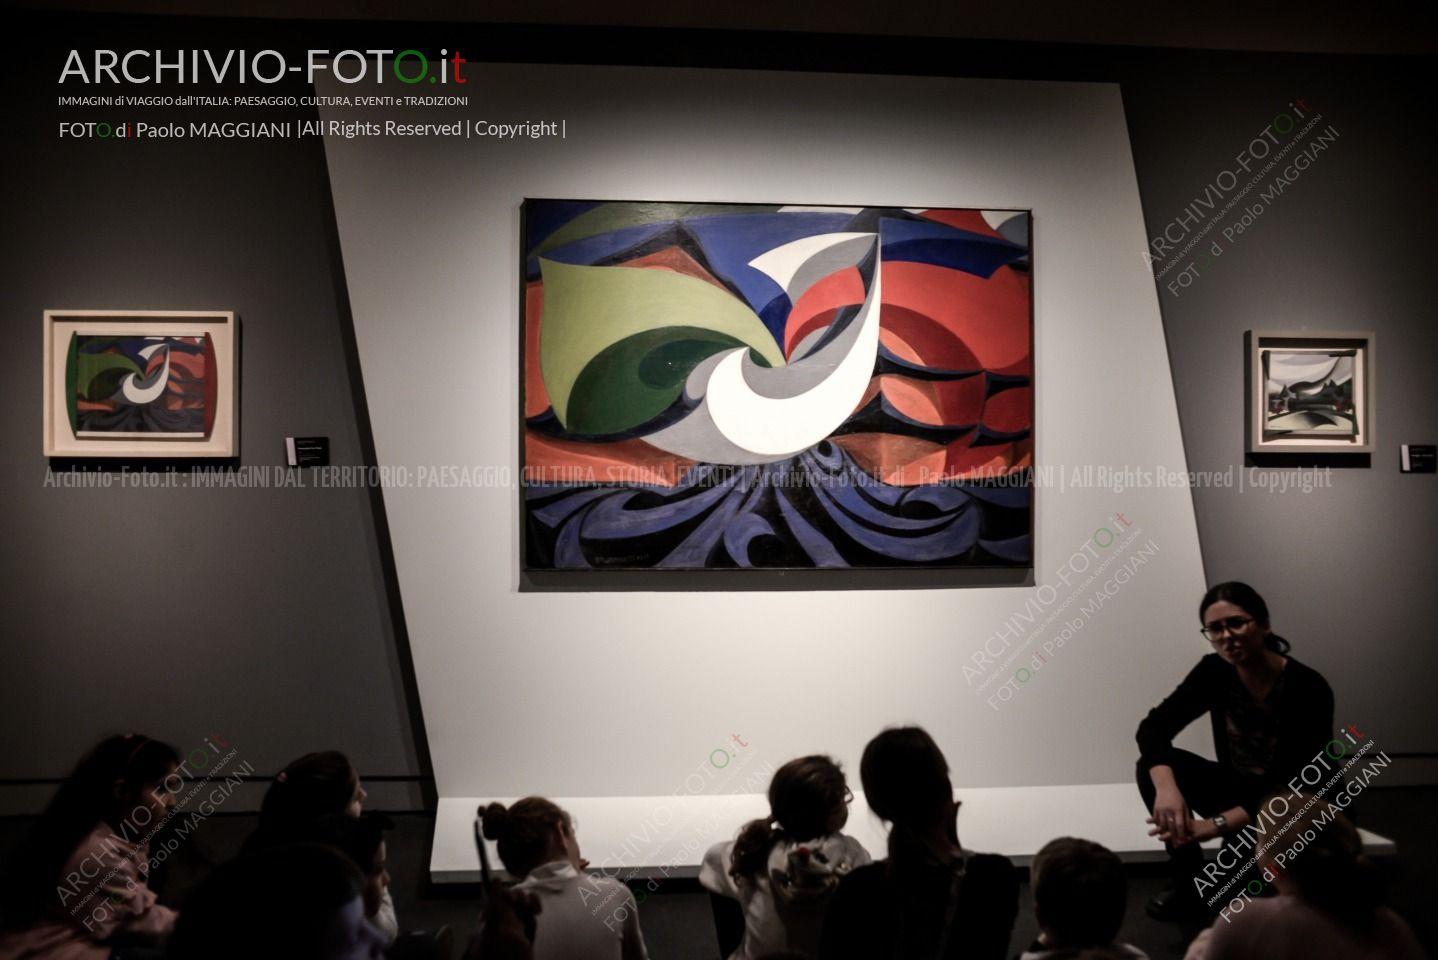 Futuristi_Palazzo_Blu_Pisa_PaoloMaggiani_it_185ND61020P_MAG0648